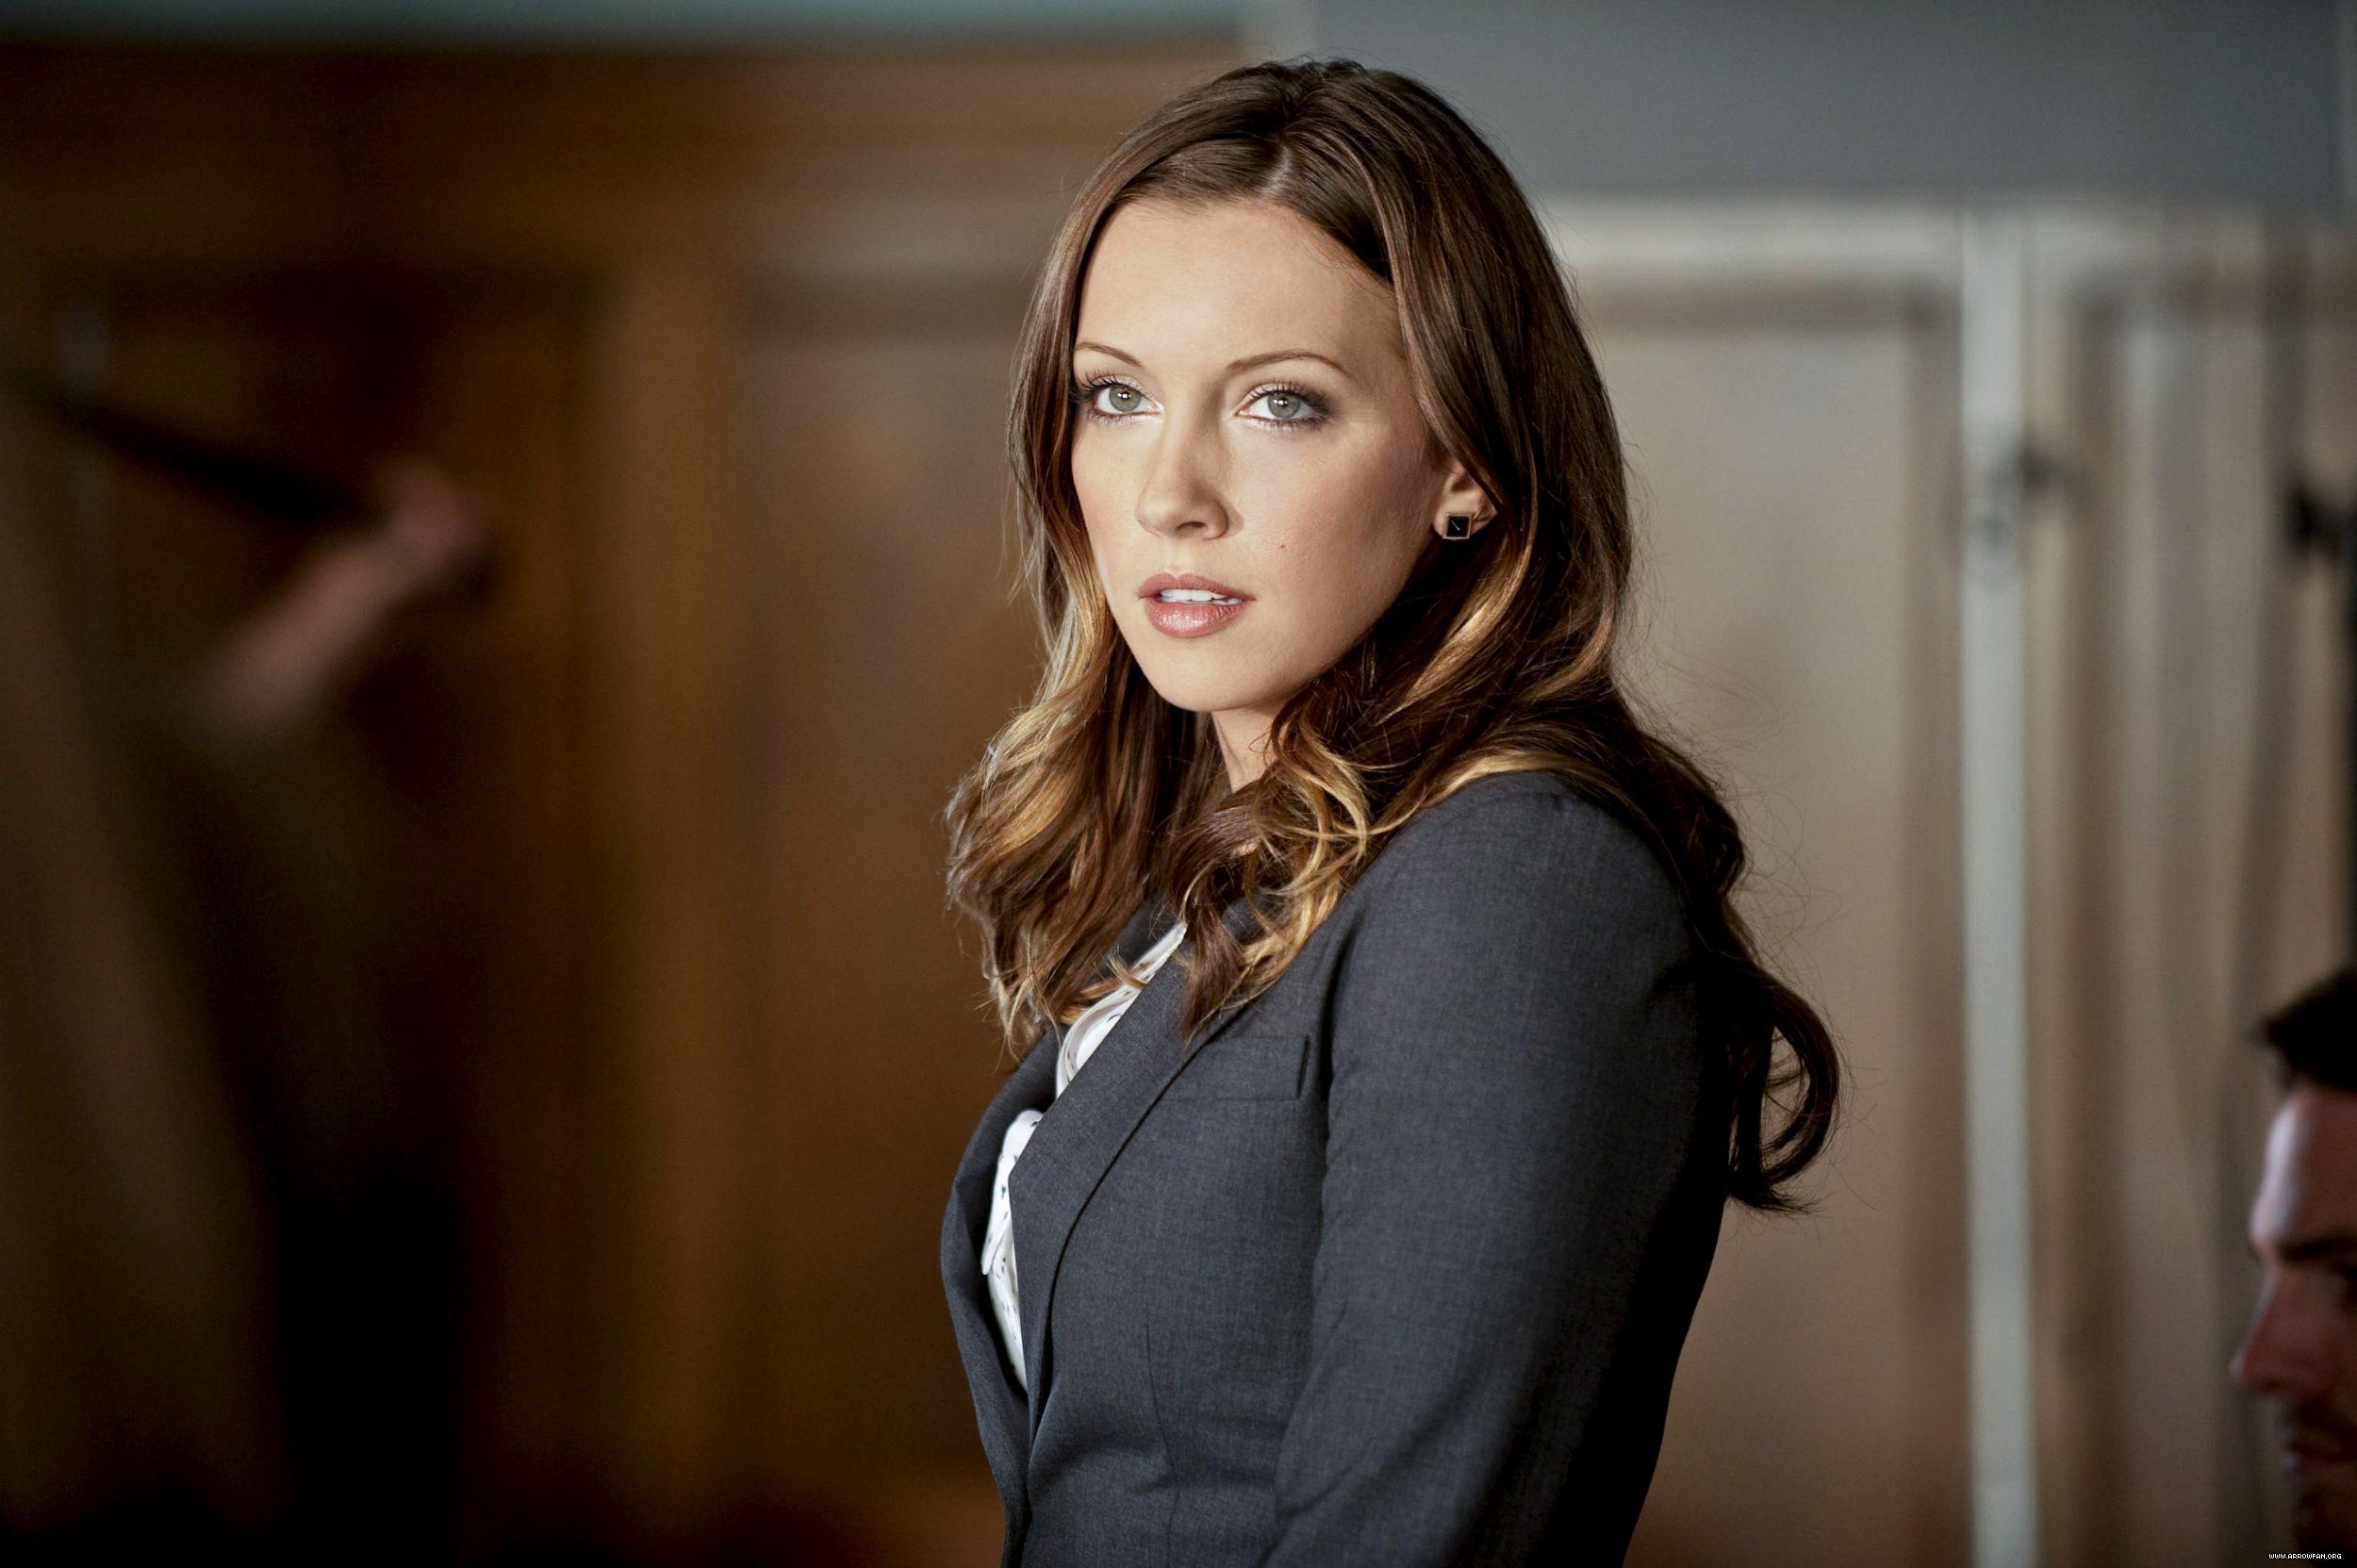 Katie Cassidy Arrow | GOSSIP | Katie Cassidy Arrow, GOSSIP, Katie Cassidy